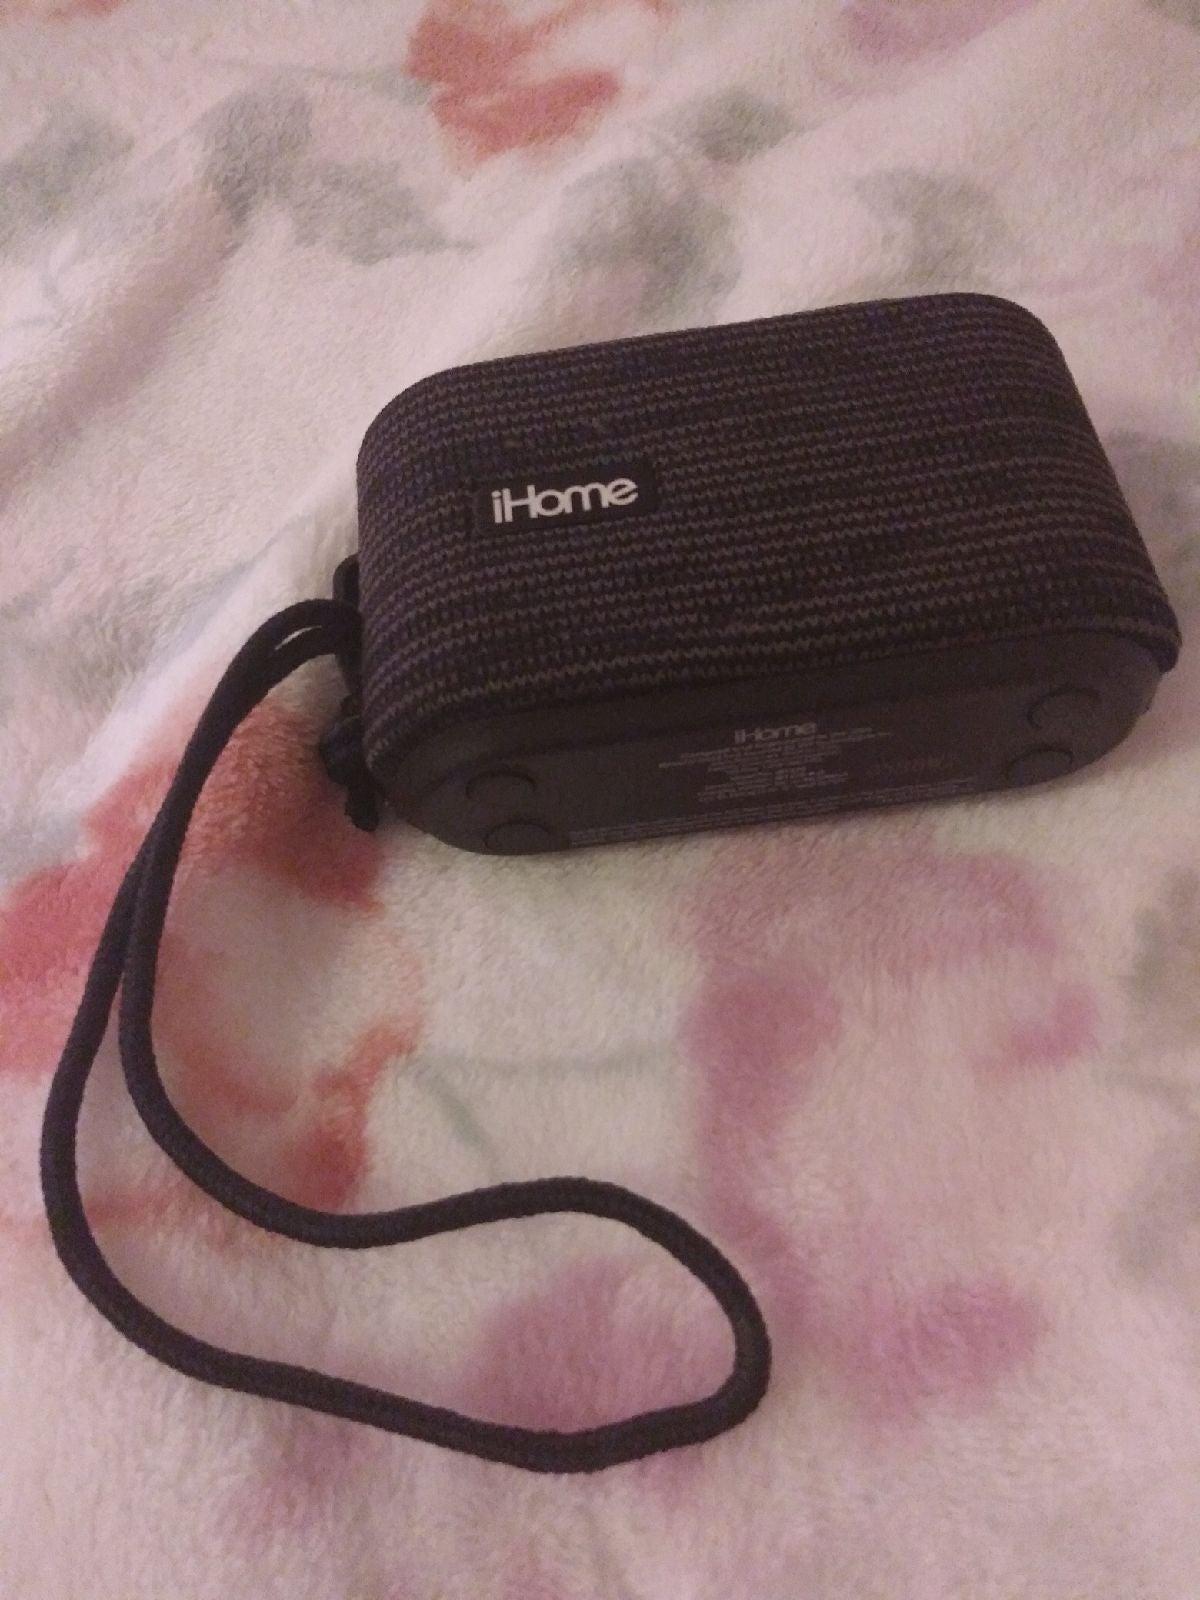 ihome IBT370 portable Bluetooth speaker